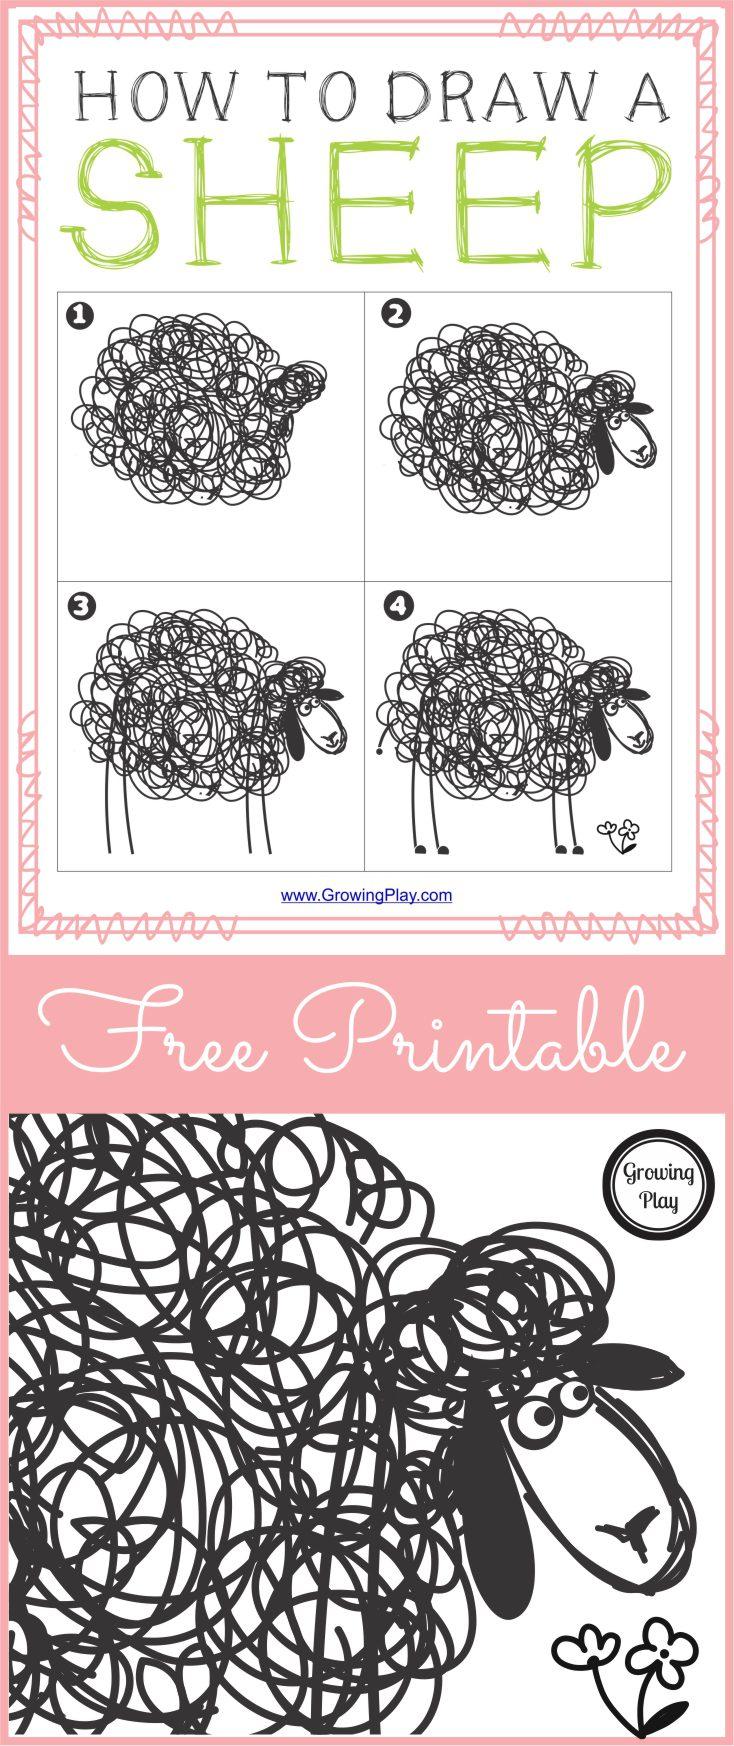 How to Draw Sheep - Free Printable